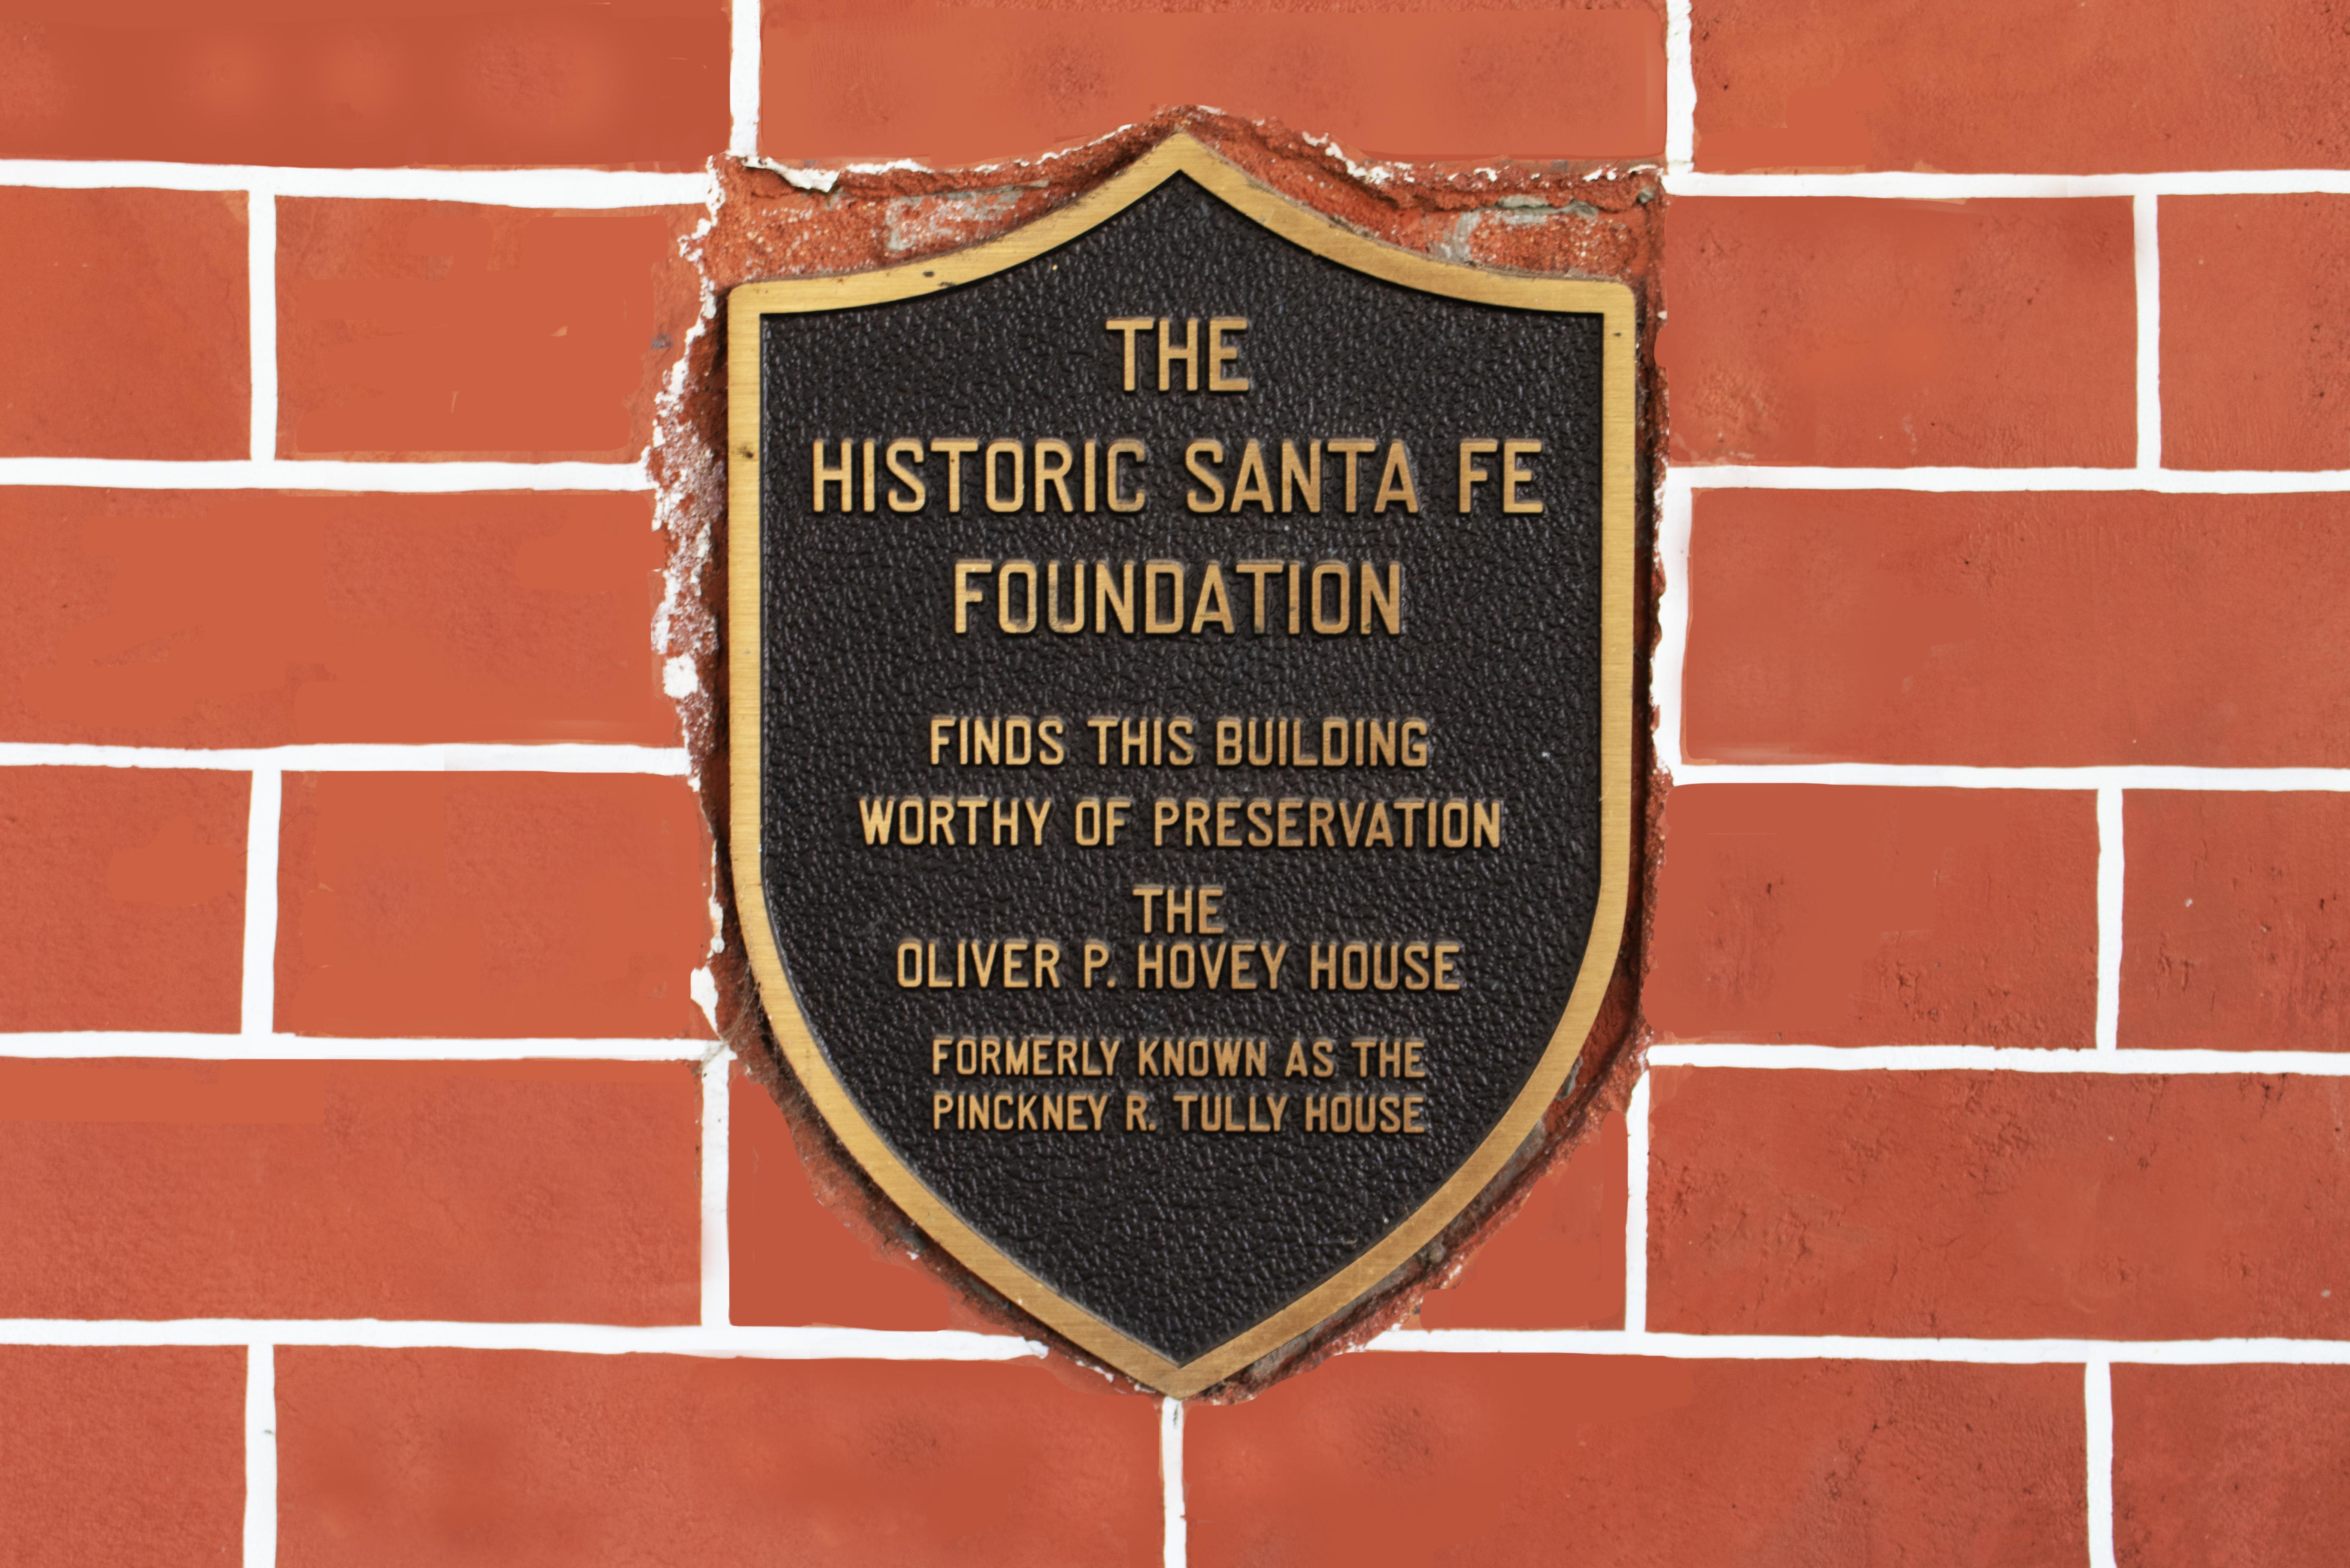 Historic Santa Fe Foundation plaque Santa Fe, New Mexico LongView Asset Management